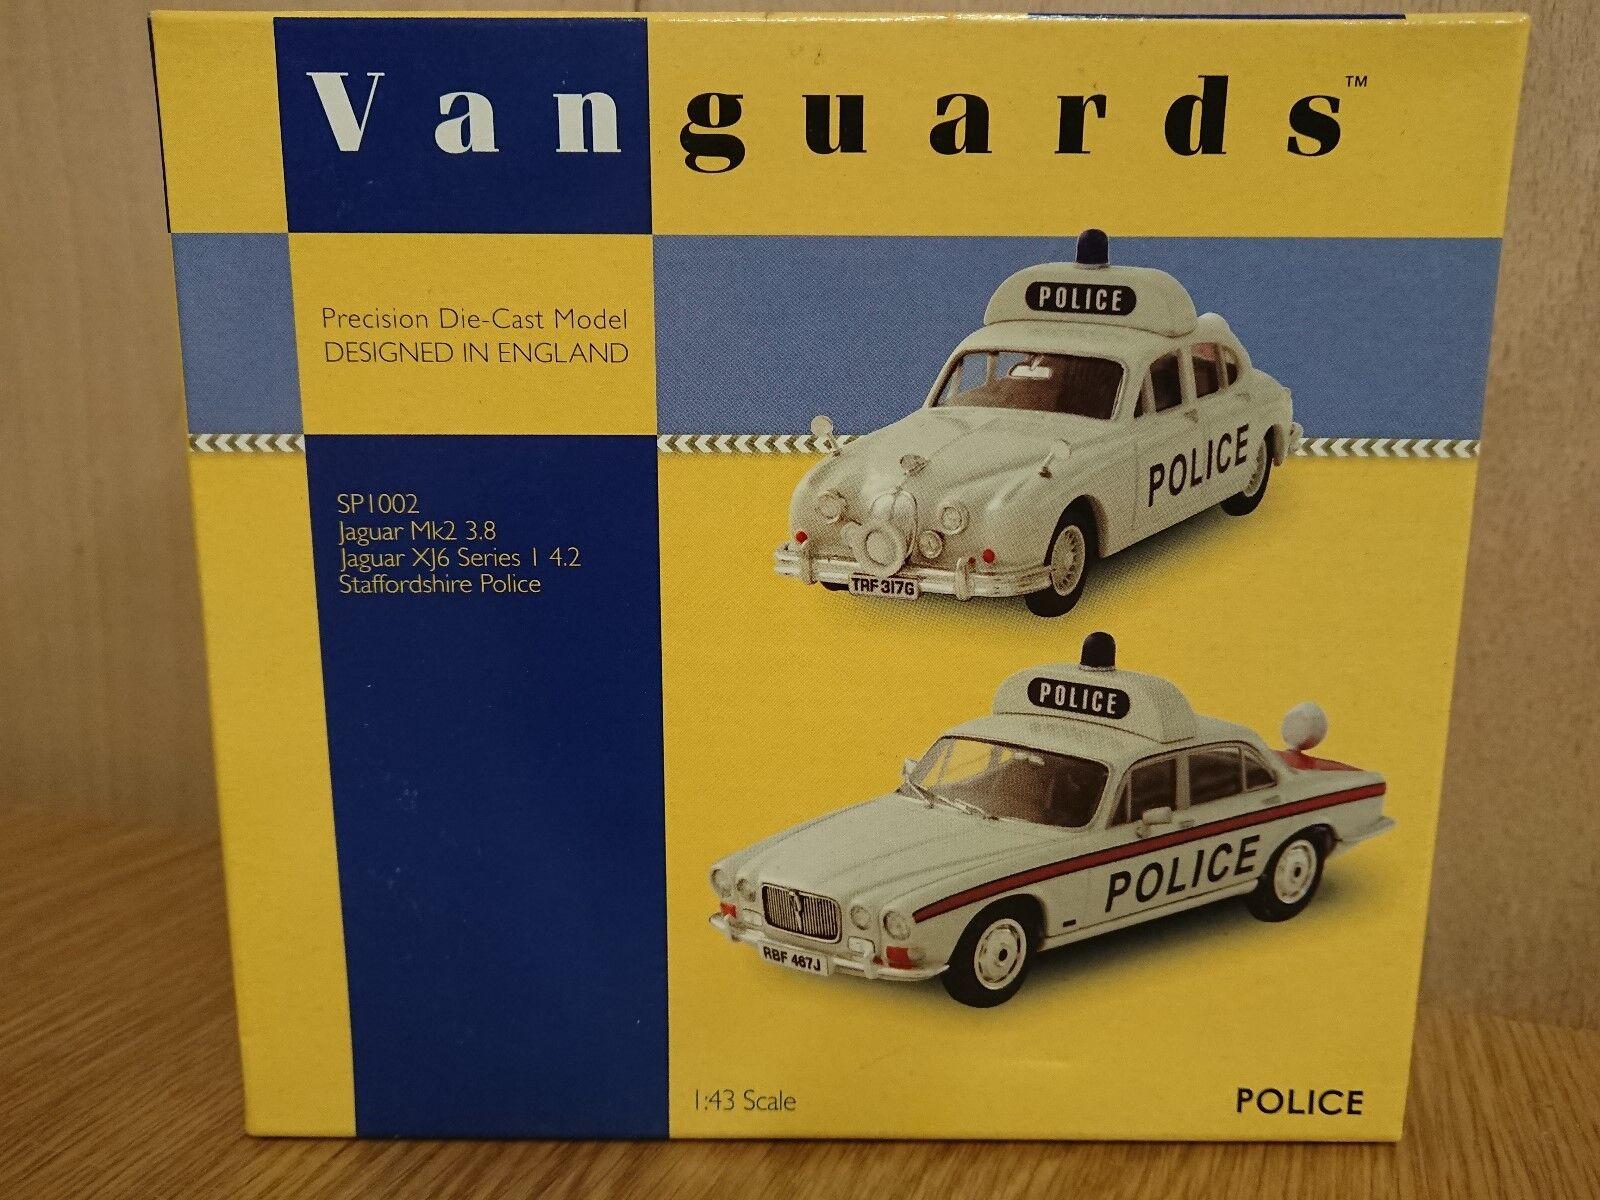 Corgi SP1002 Twin set Jaguar Mk2 3.8 & XJ6 S.1 4.2 Staffs. Police Factory Sample